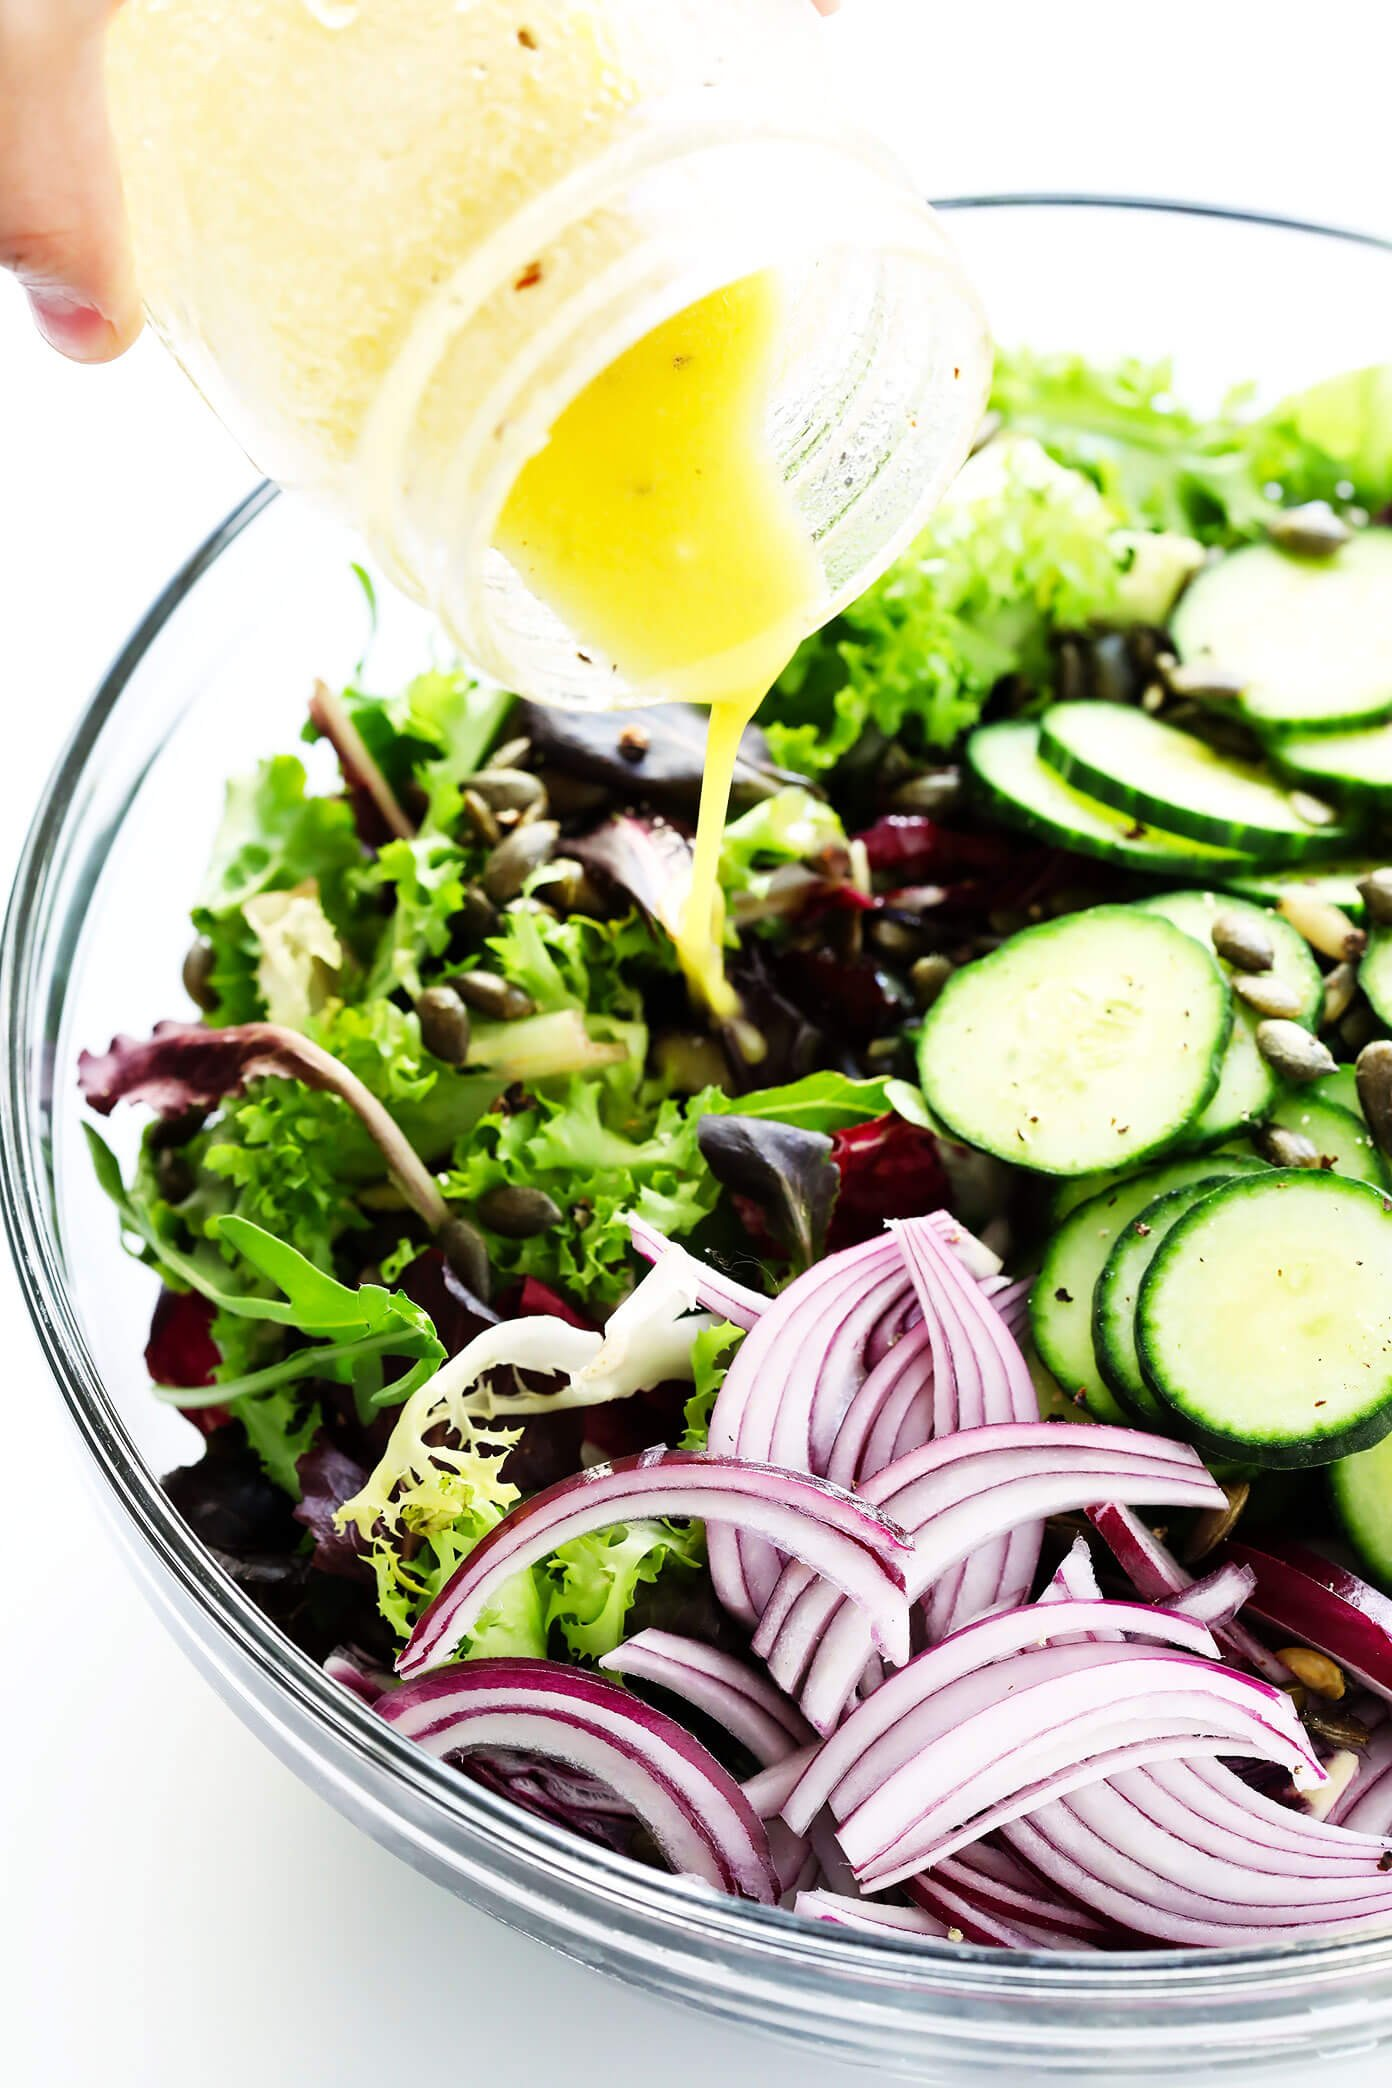 How To Make Salad